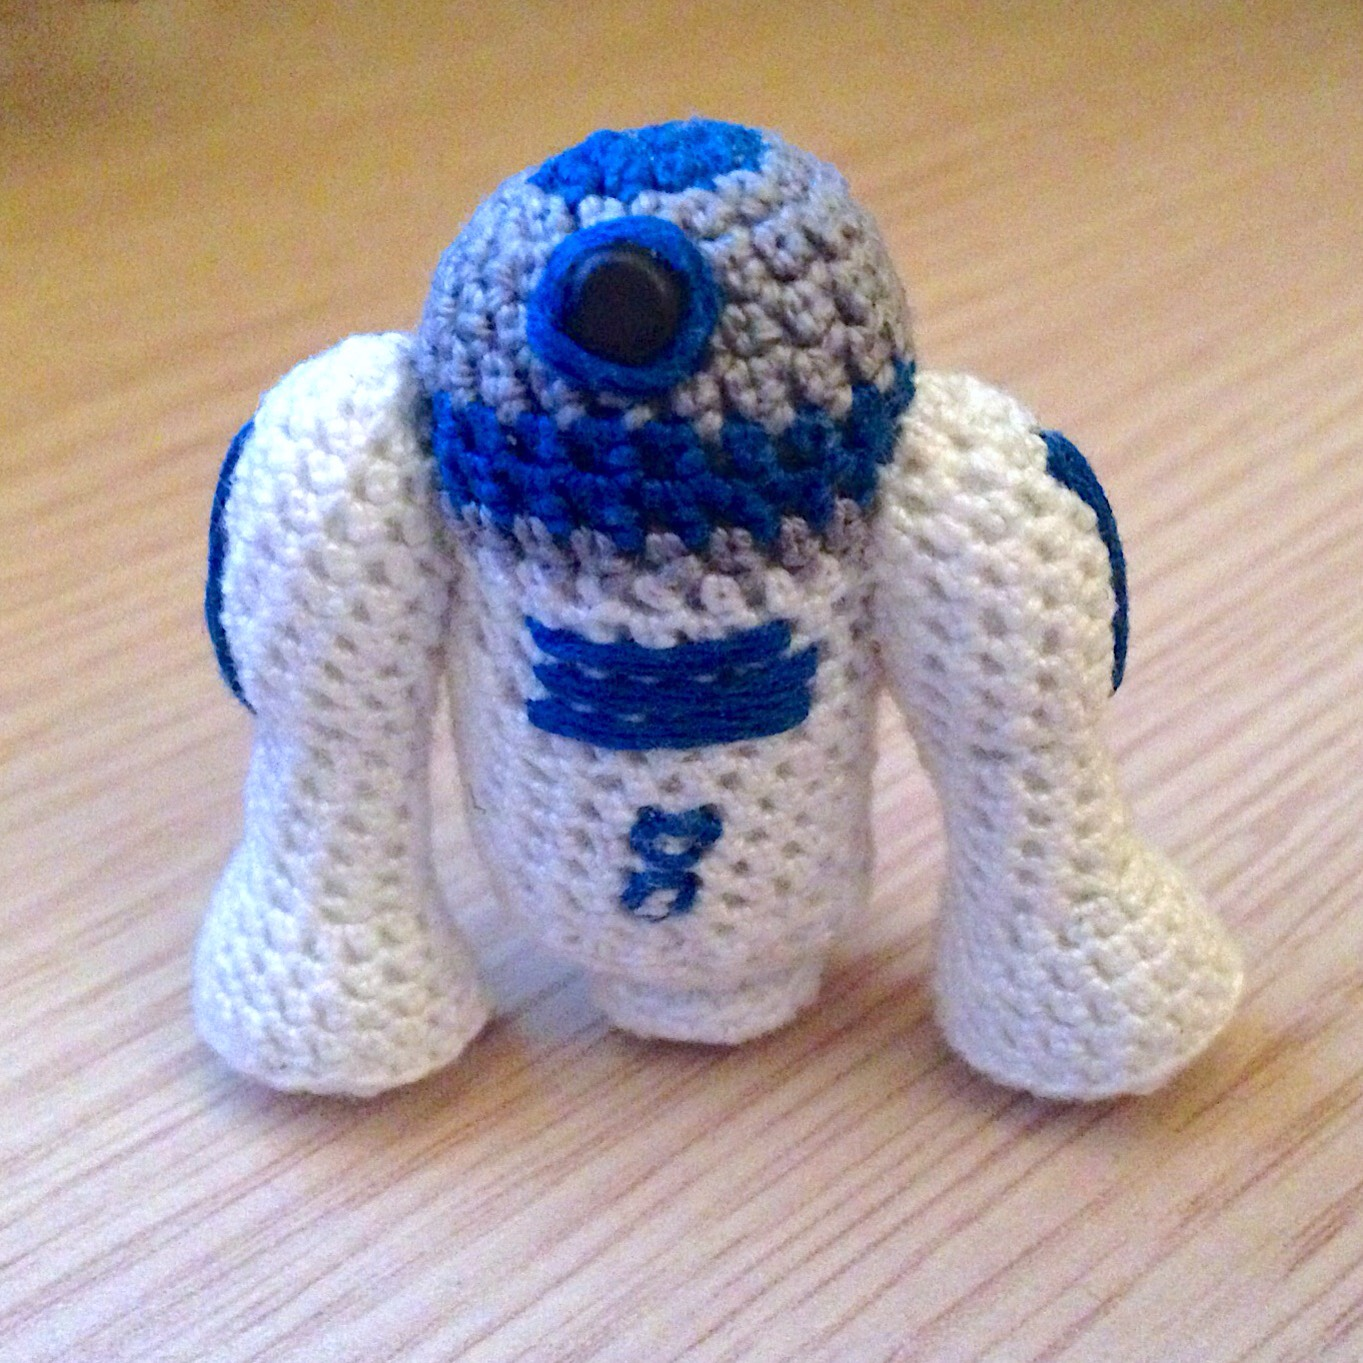 Amigurumi Tutorial Uncinetto : La piccola bottega della Creativit?: Star Wars: R2-D2 ...